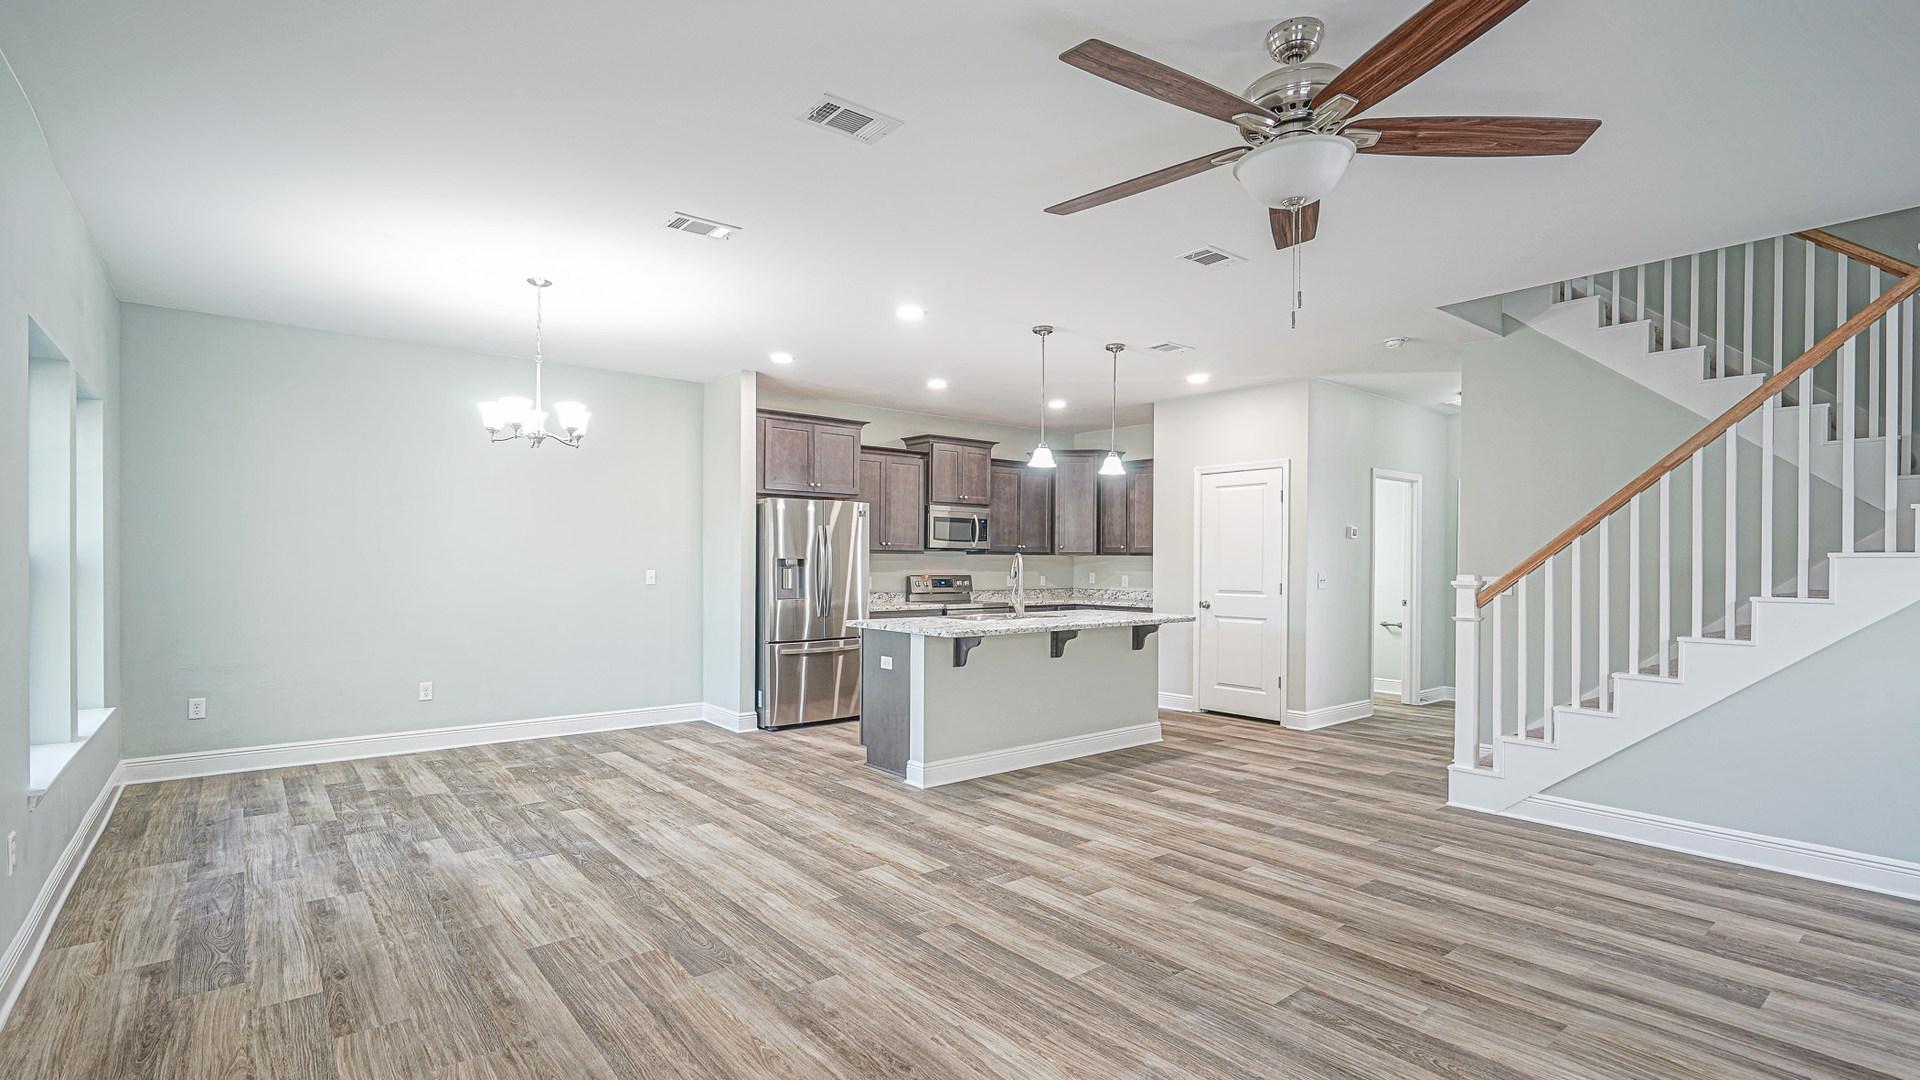 196 Johnson Ct Shiloh Place Living Area